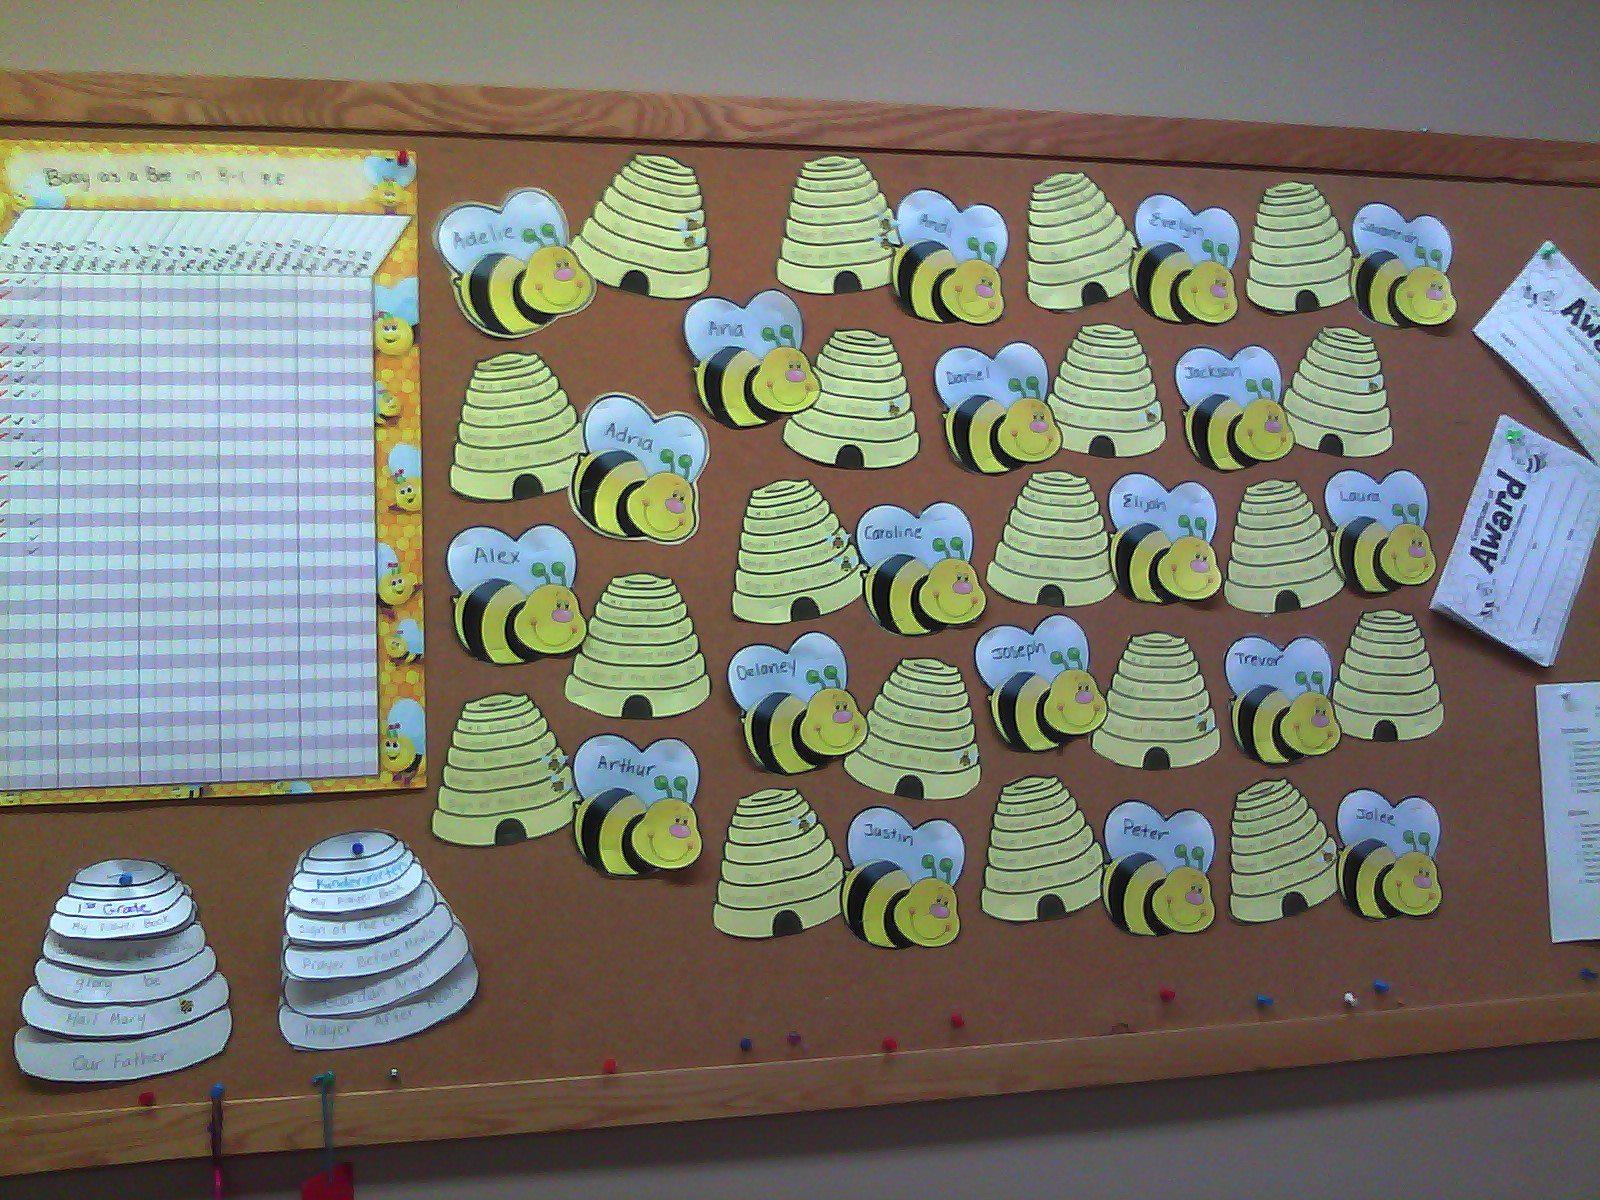 Bumble Bee Bulletin Board Prayer Tracking